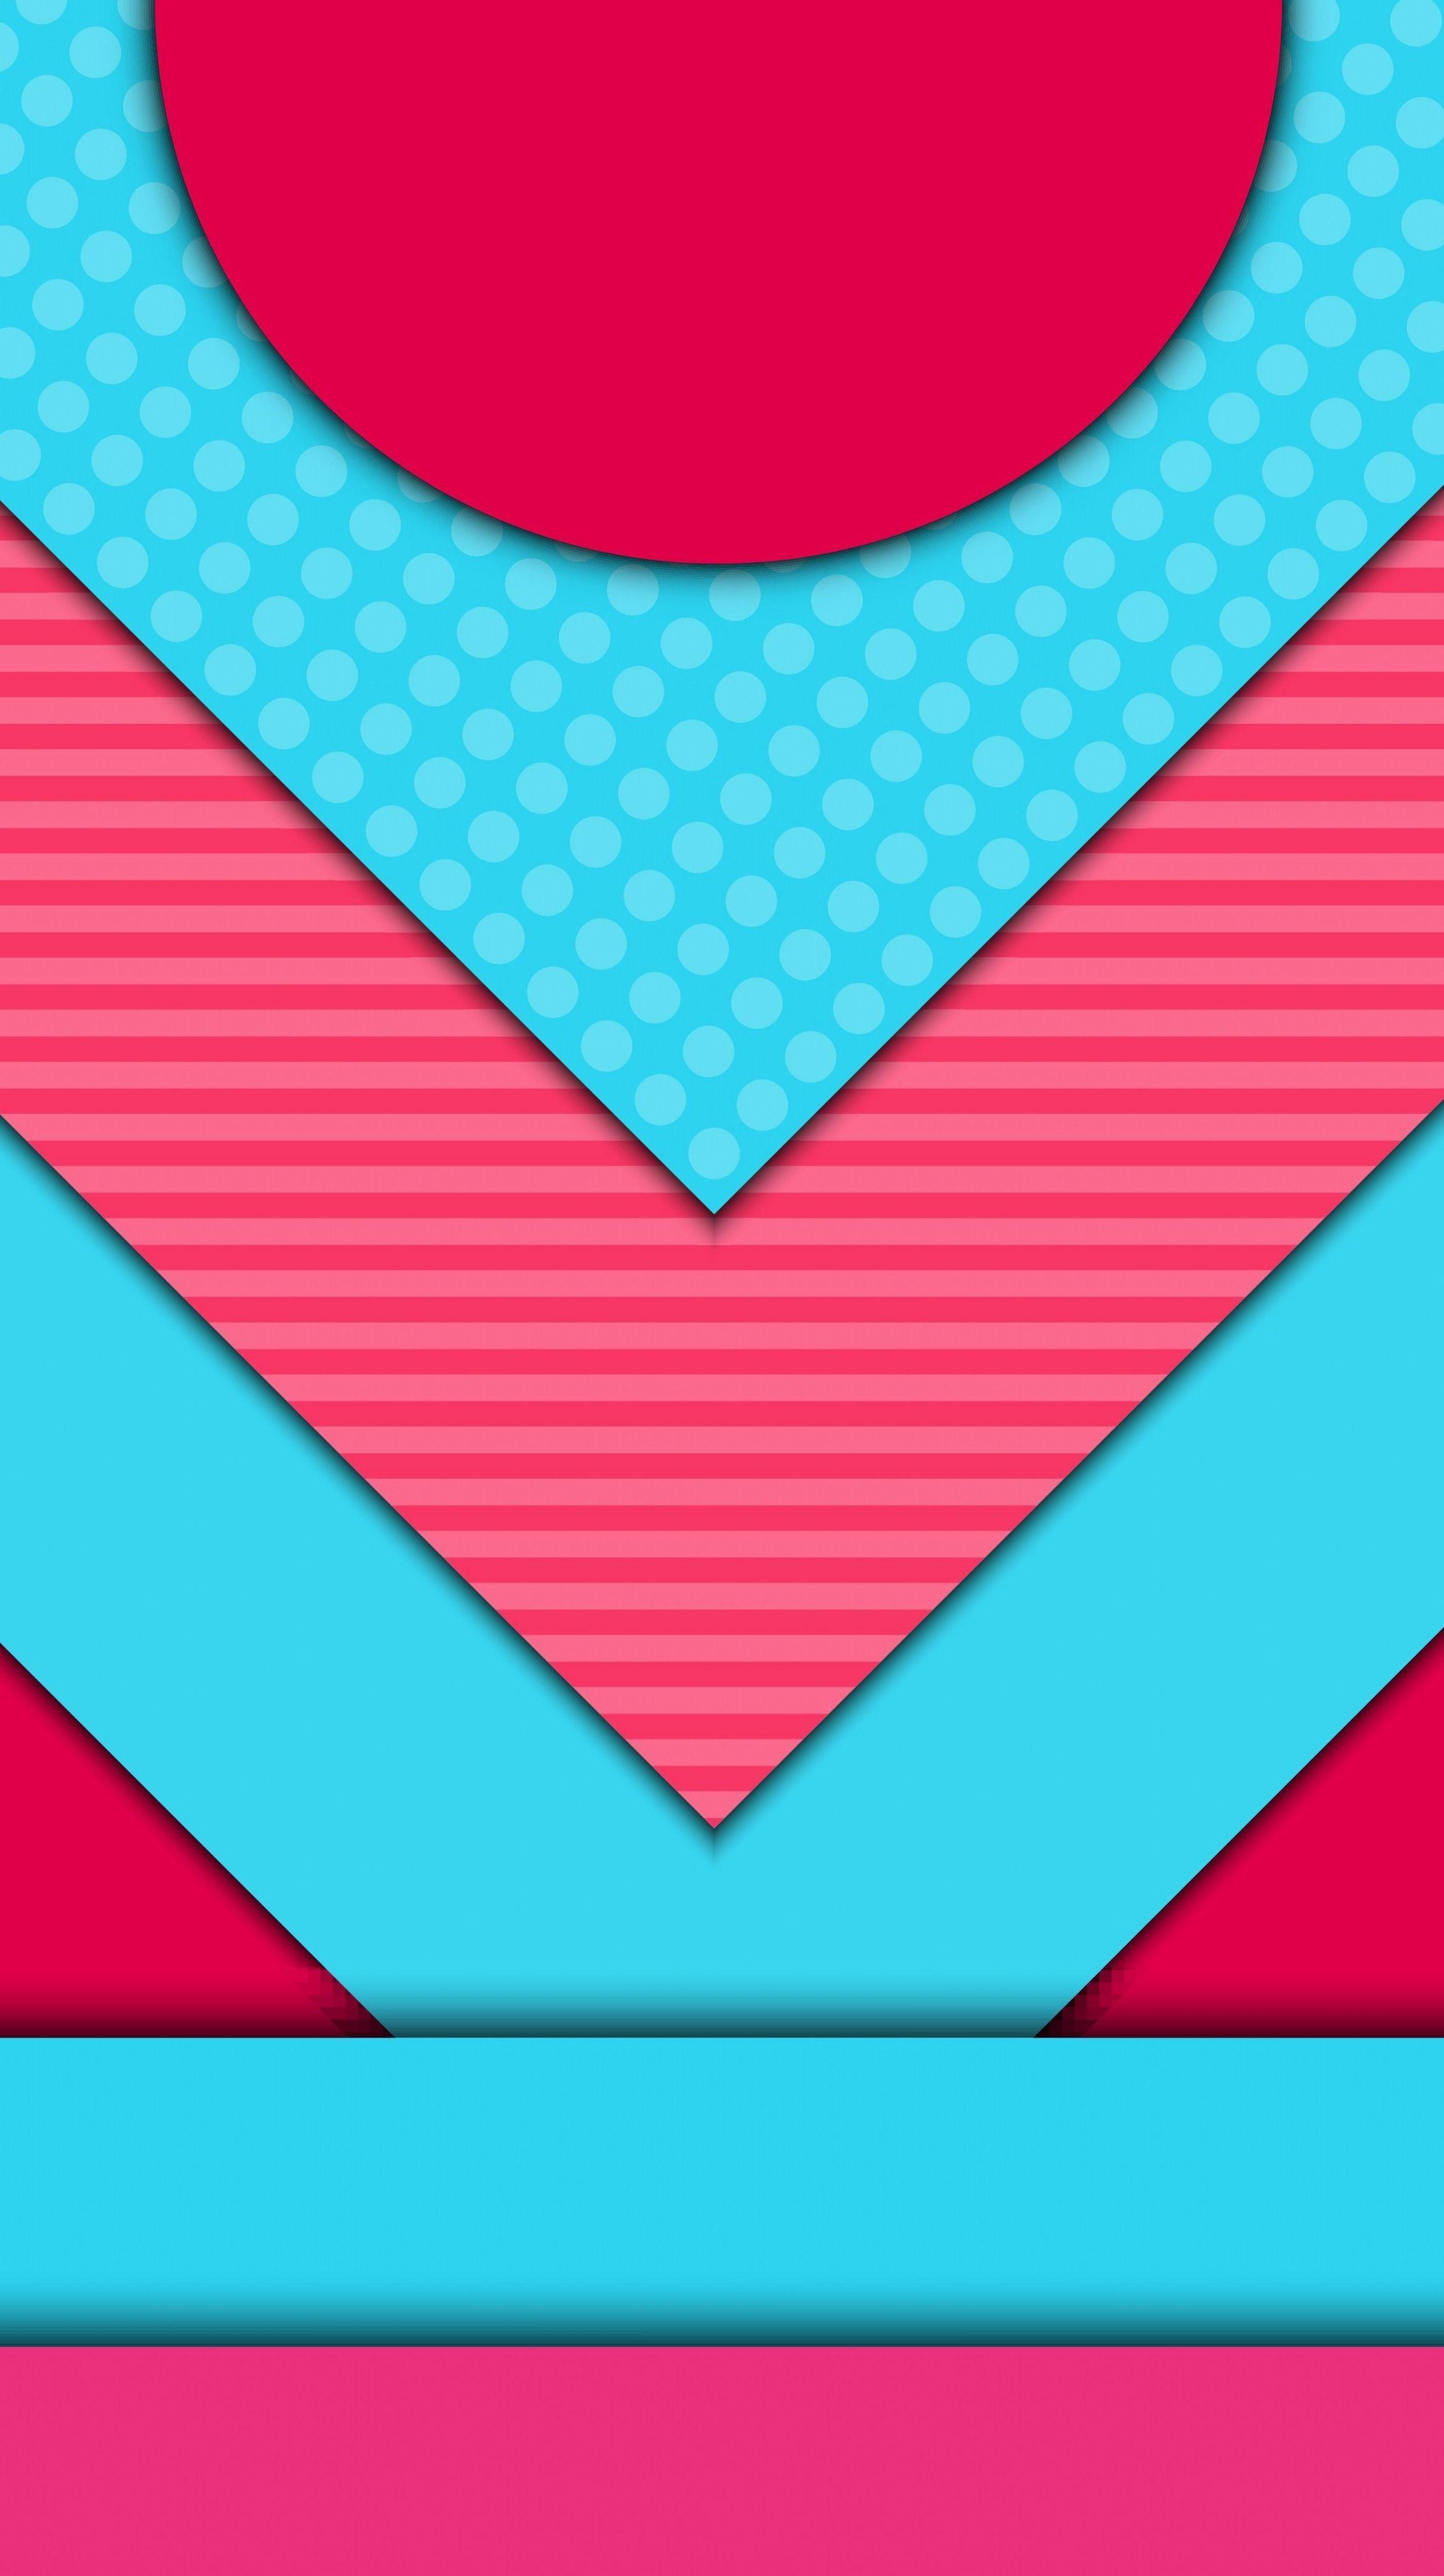 Pink and Aqua Geometric Abstract Wallpaper abstract art